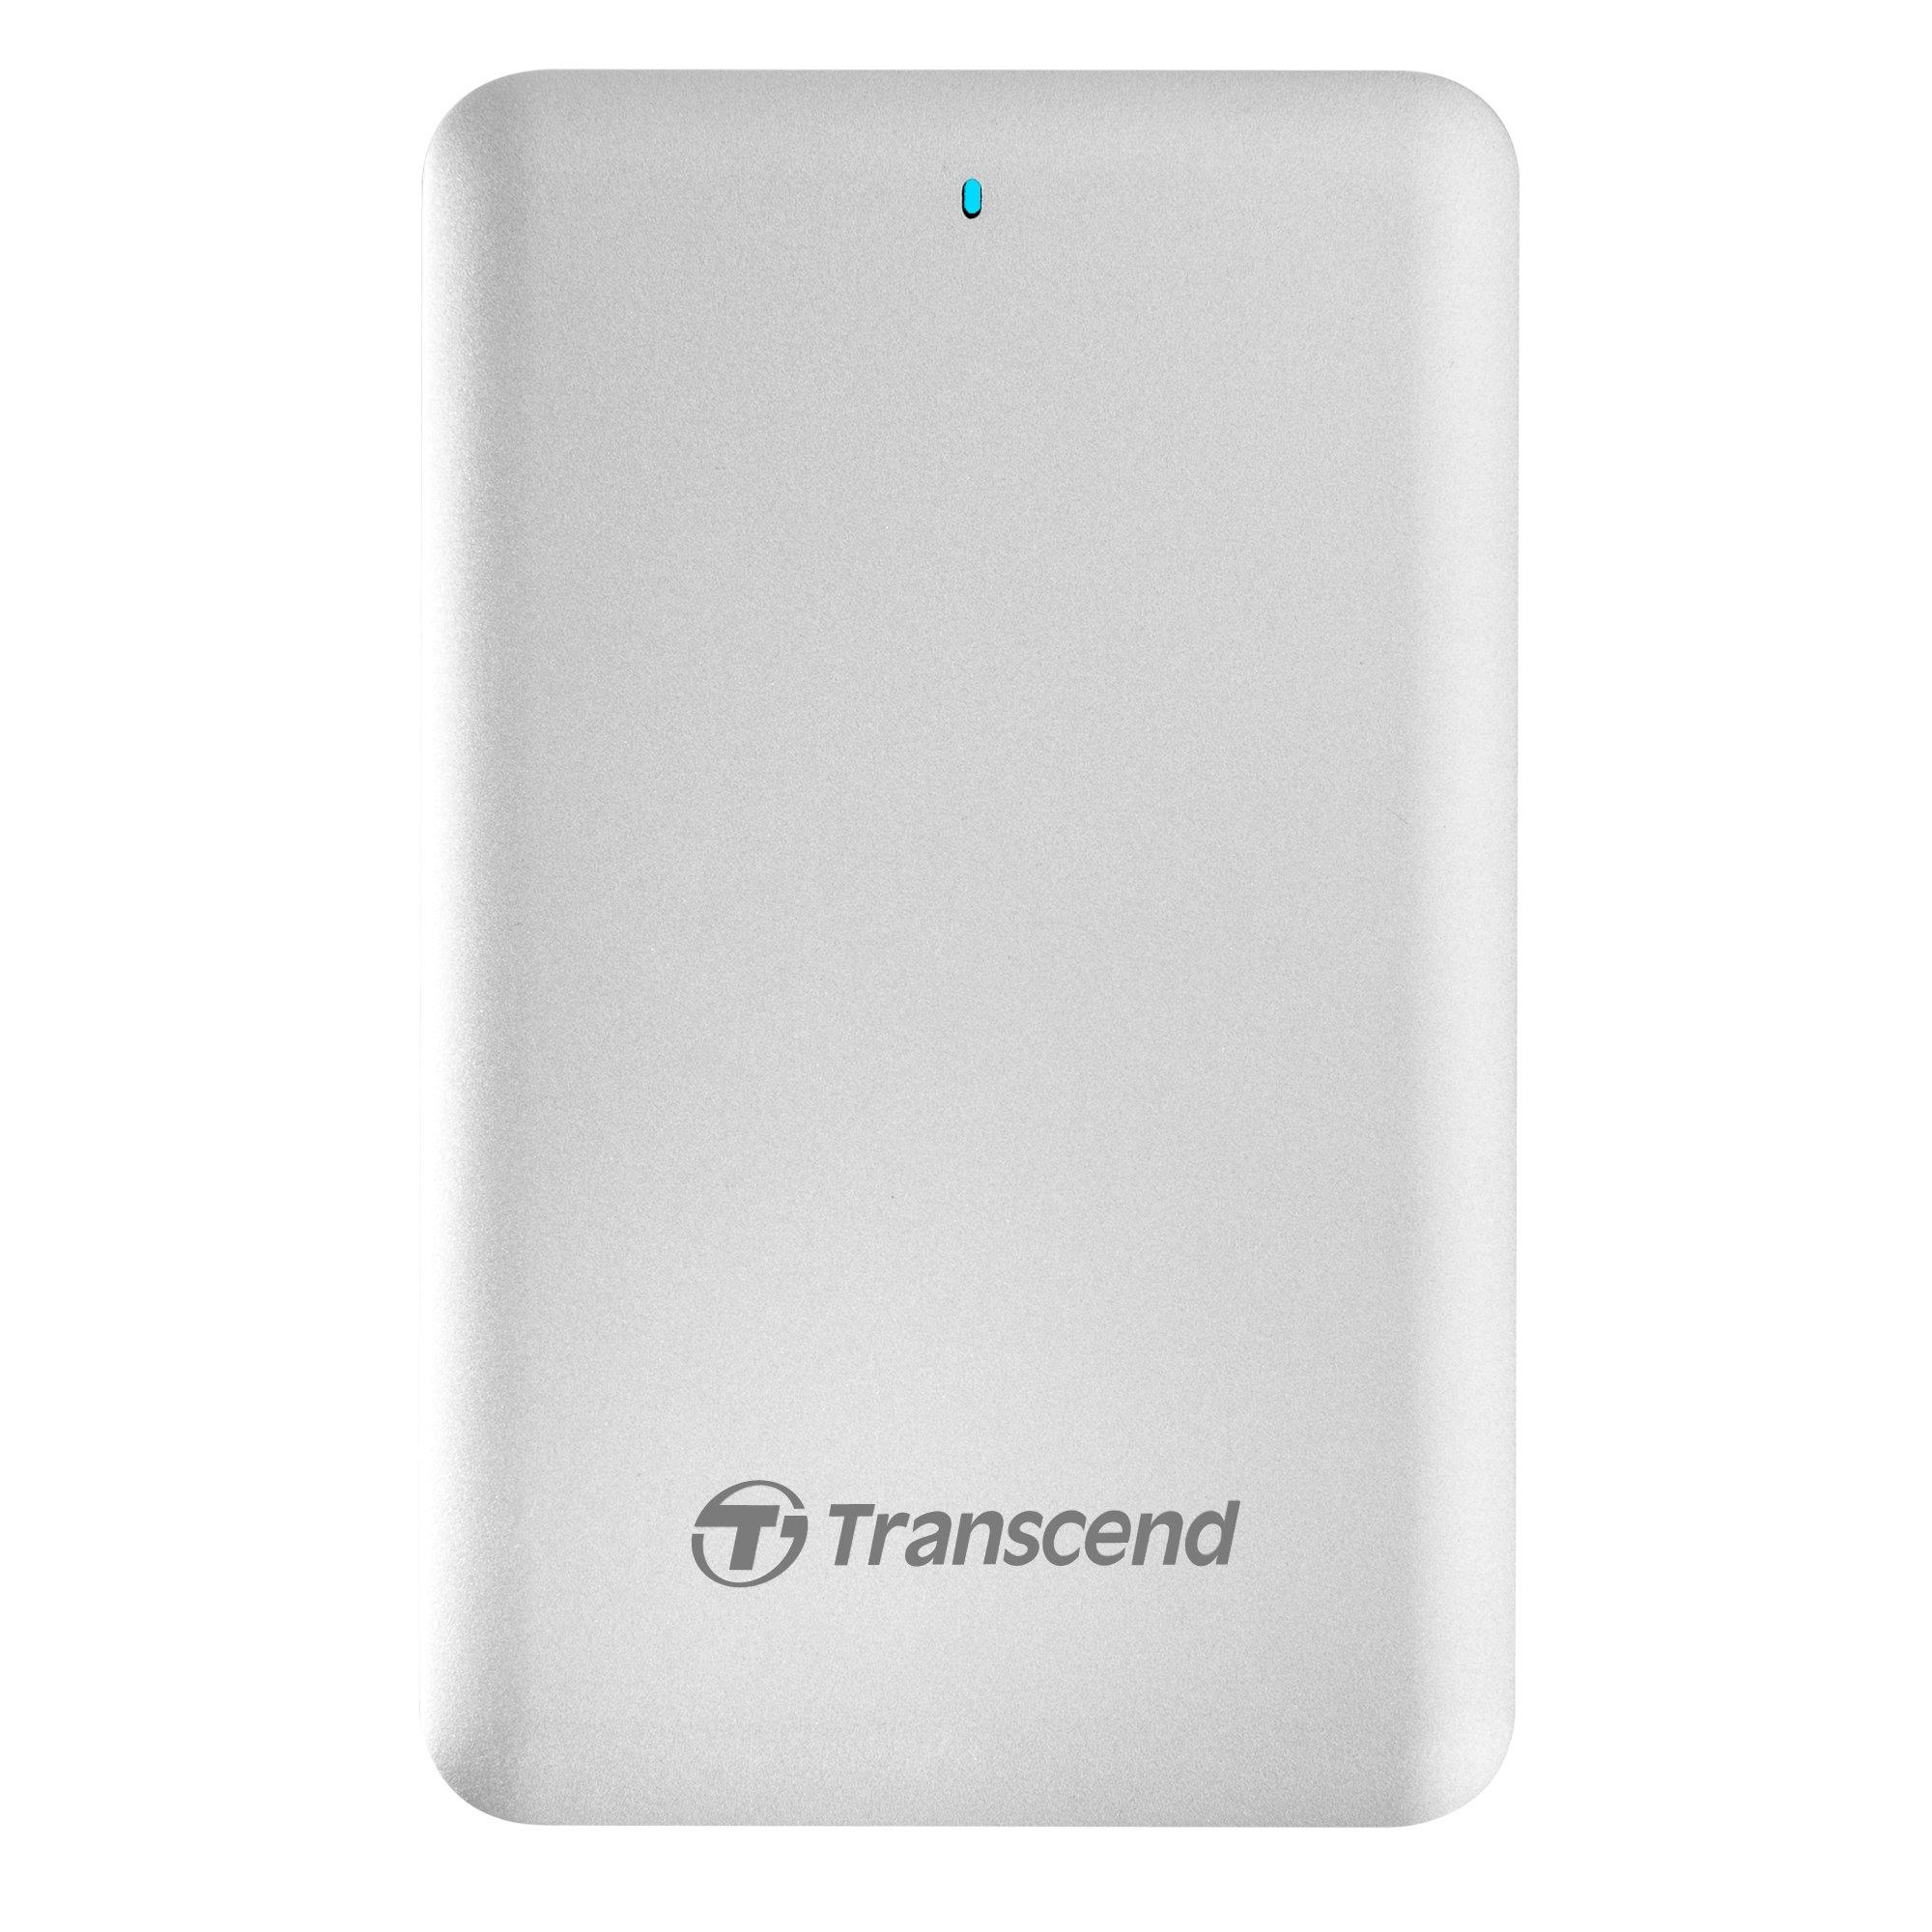 Transcend 2TB Thunderbolt USB 3.0 External Hard Drive for MAC (TS2TSJM300) by Transcend